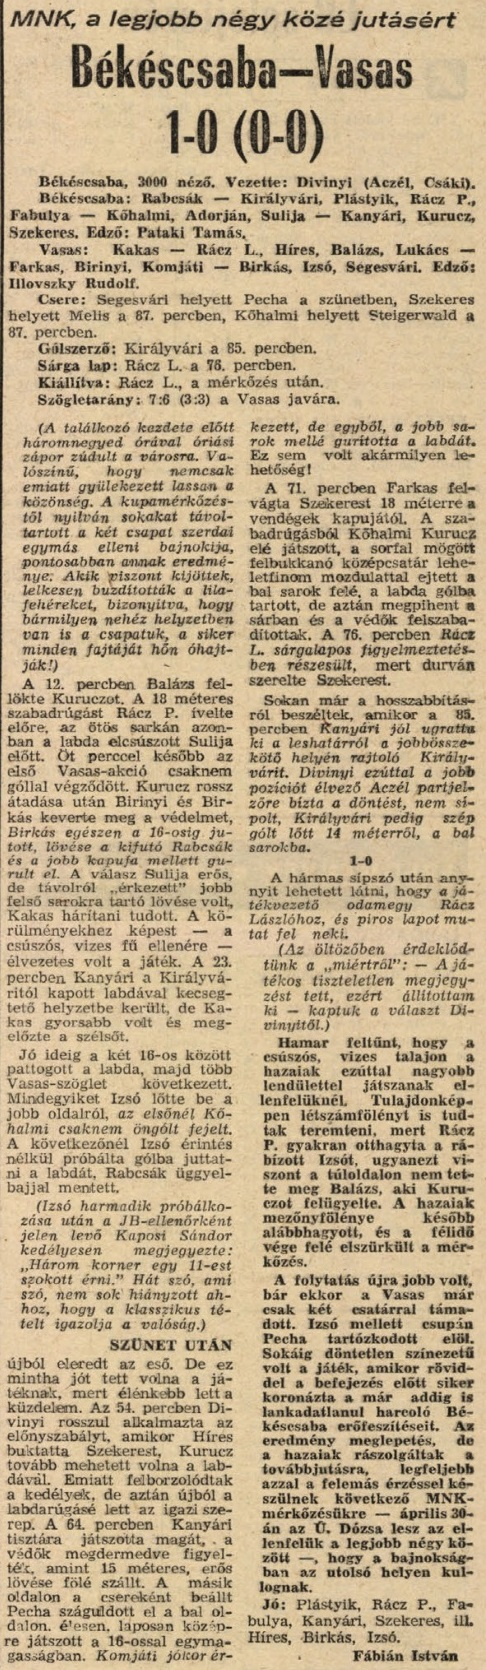 idokapszula_nb_i_1982_83_anglia_magyarorszag_mnk_bekescsaba_vasas.jpg